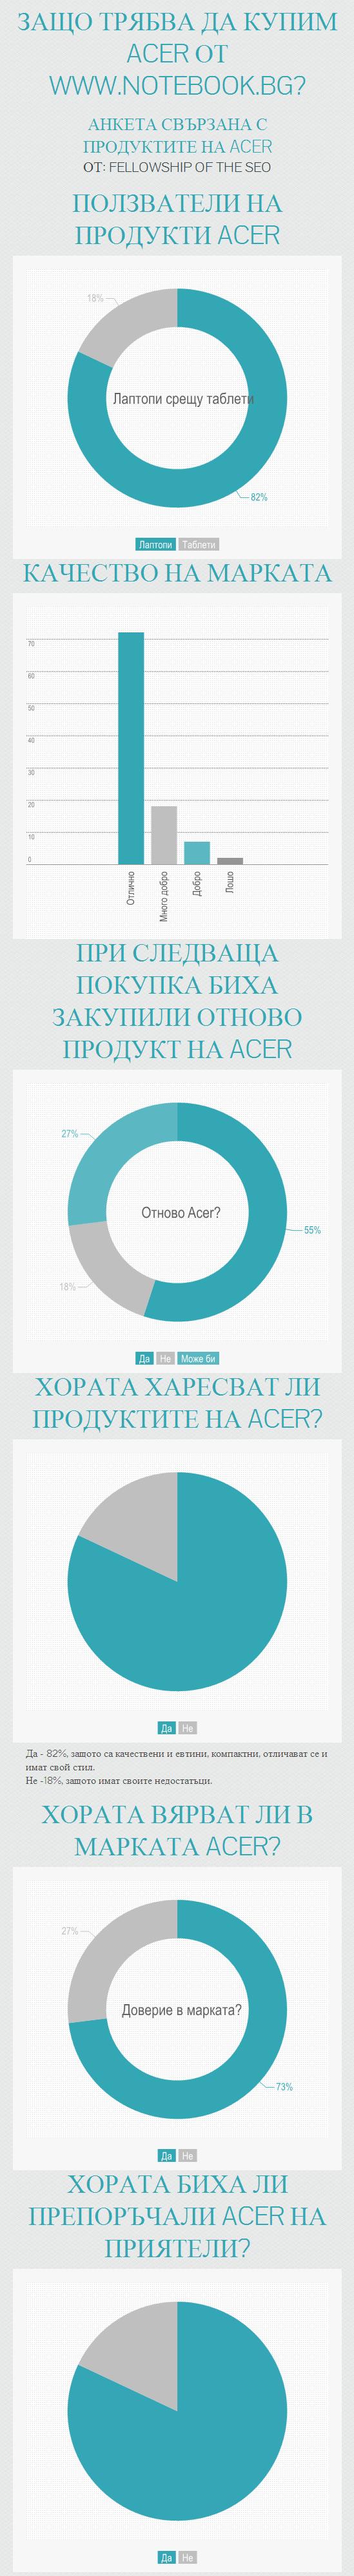 Инфографика за продуктите на Acer